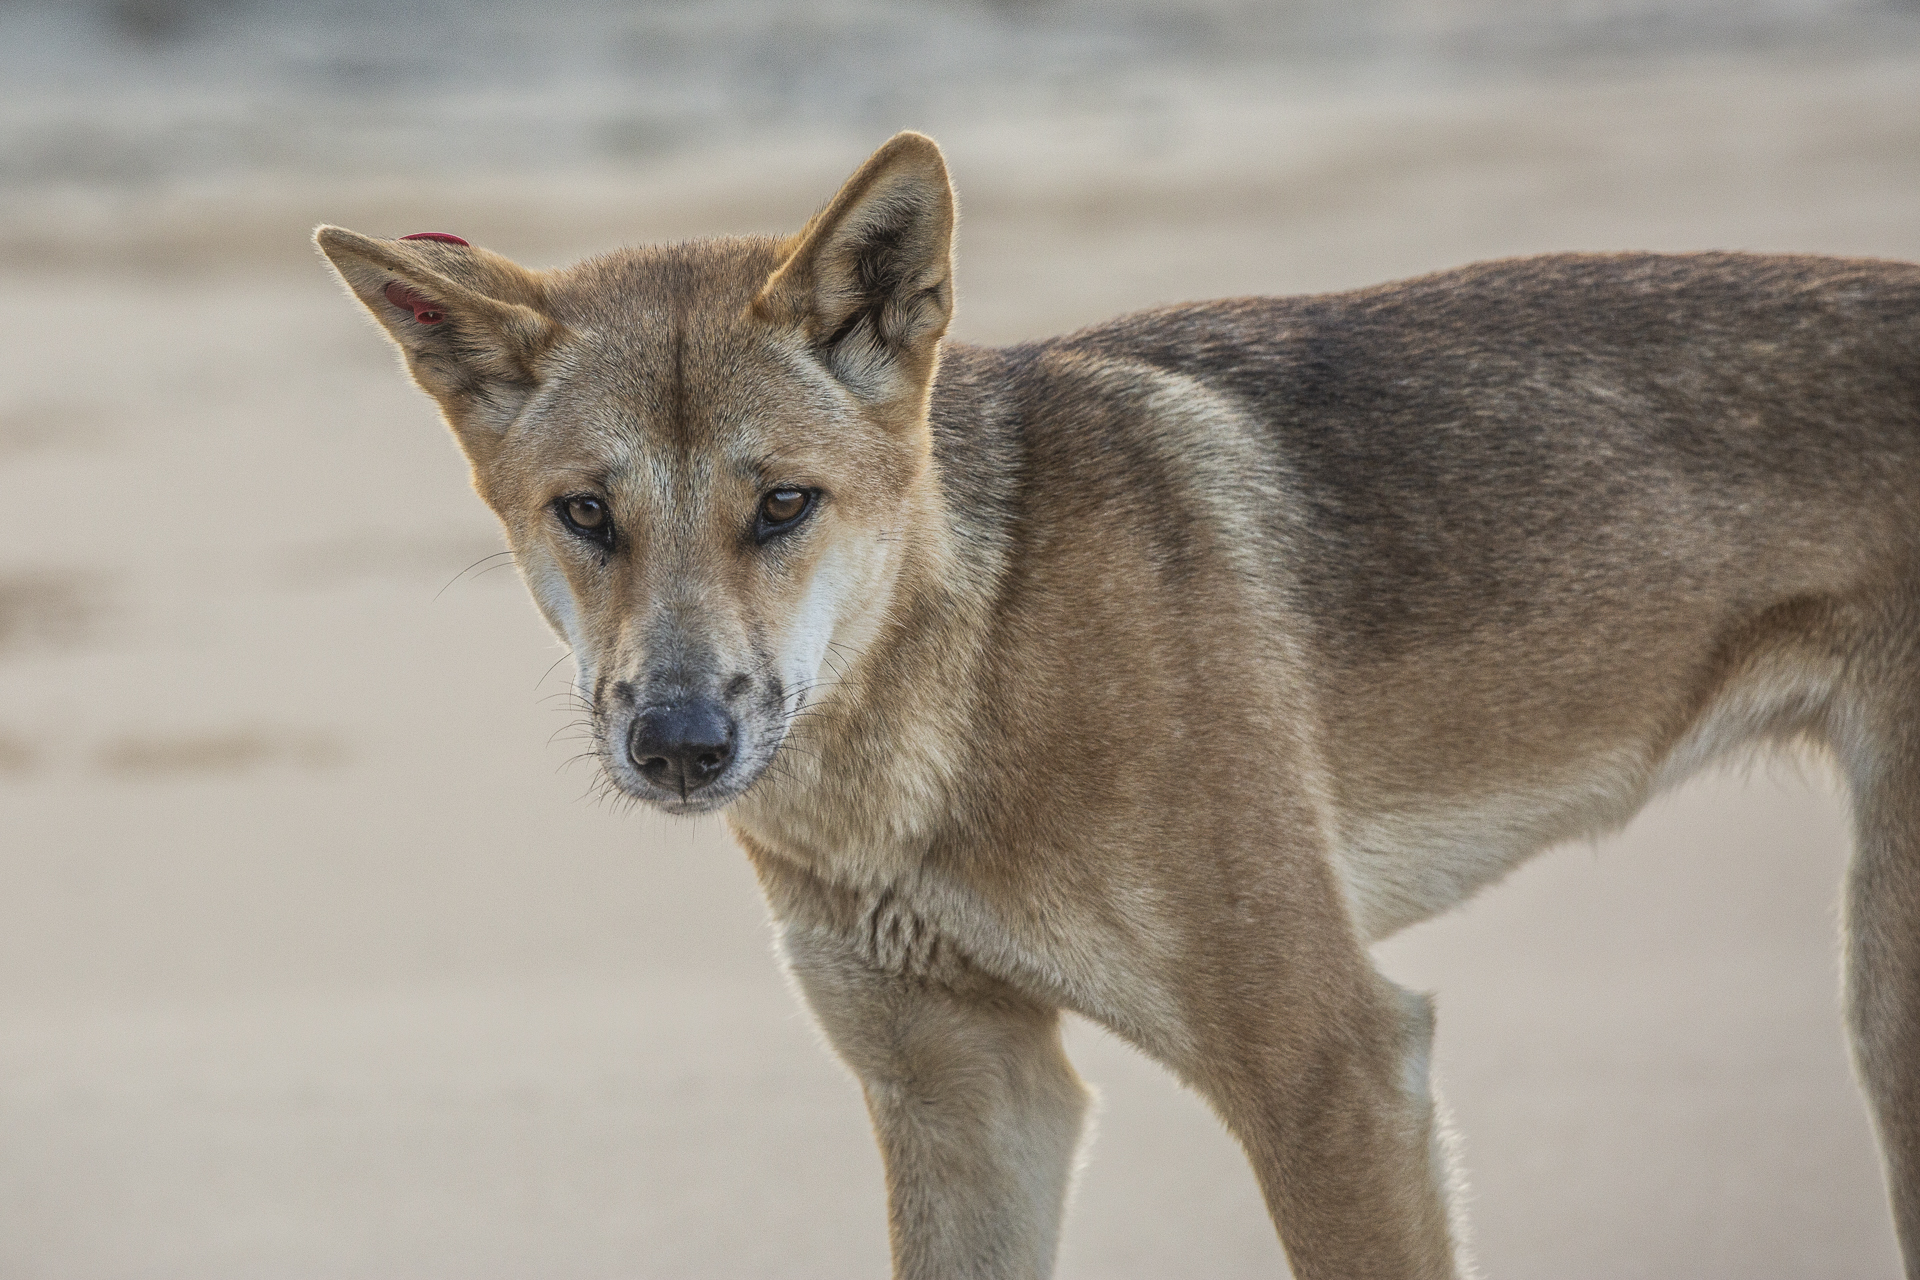 Dingoes are wild animals: Be dingo safe!